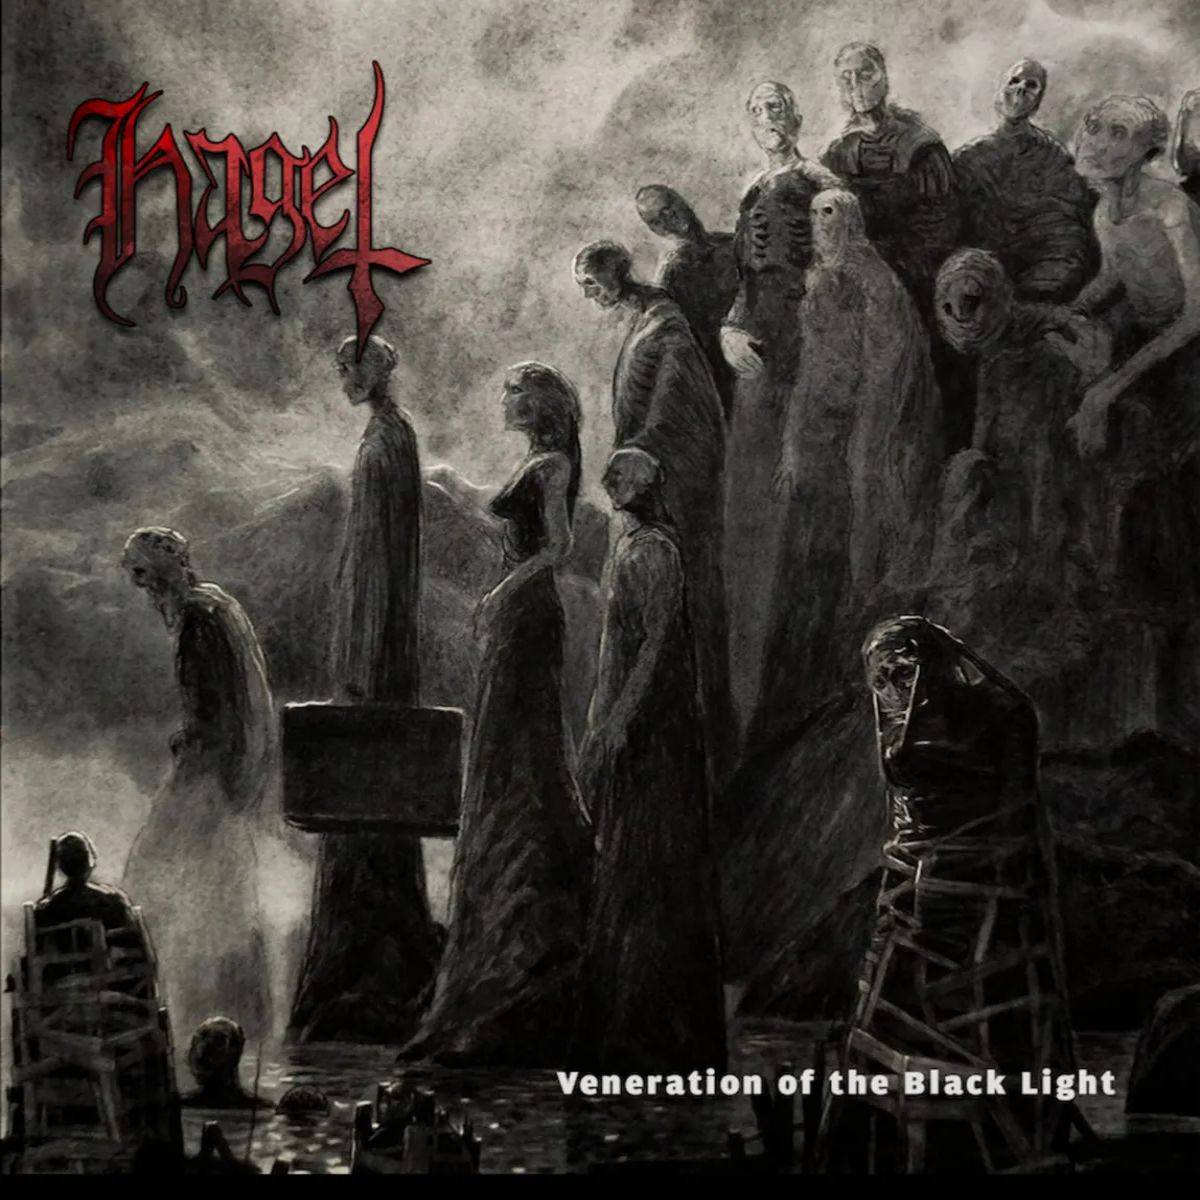 Reviews for Hagel - Veneration of the Black Light